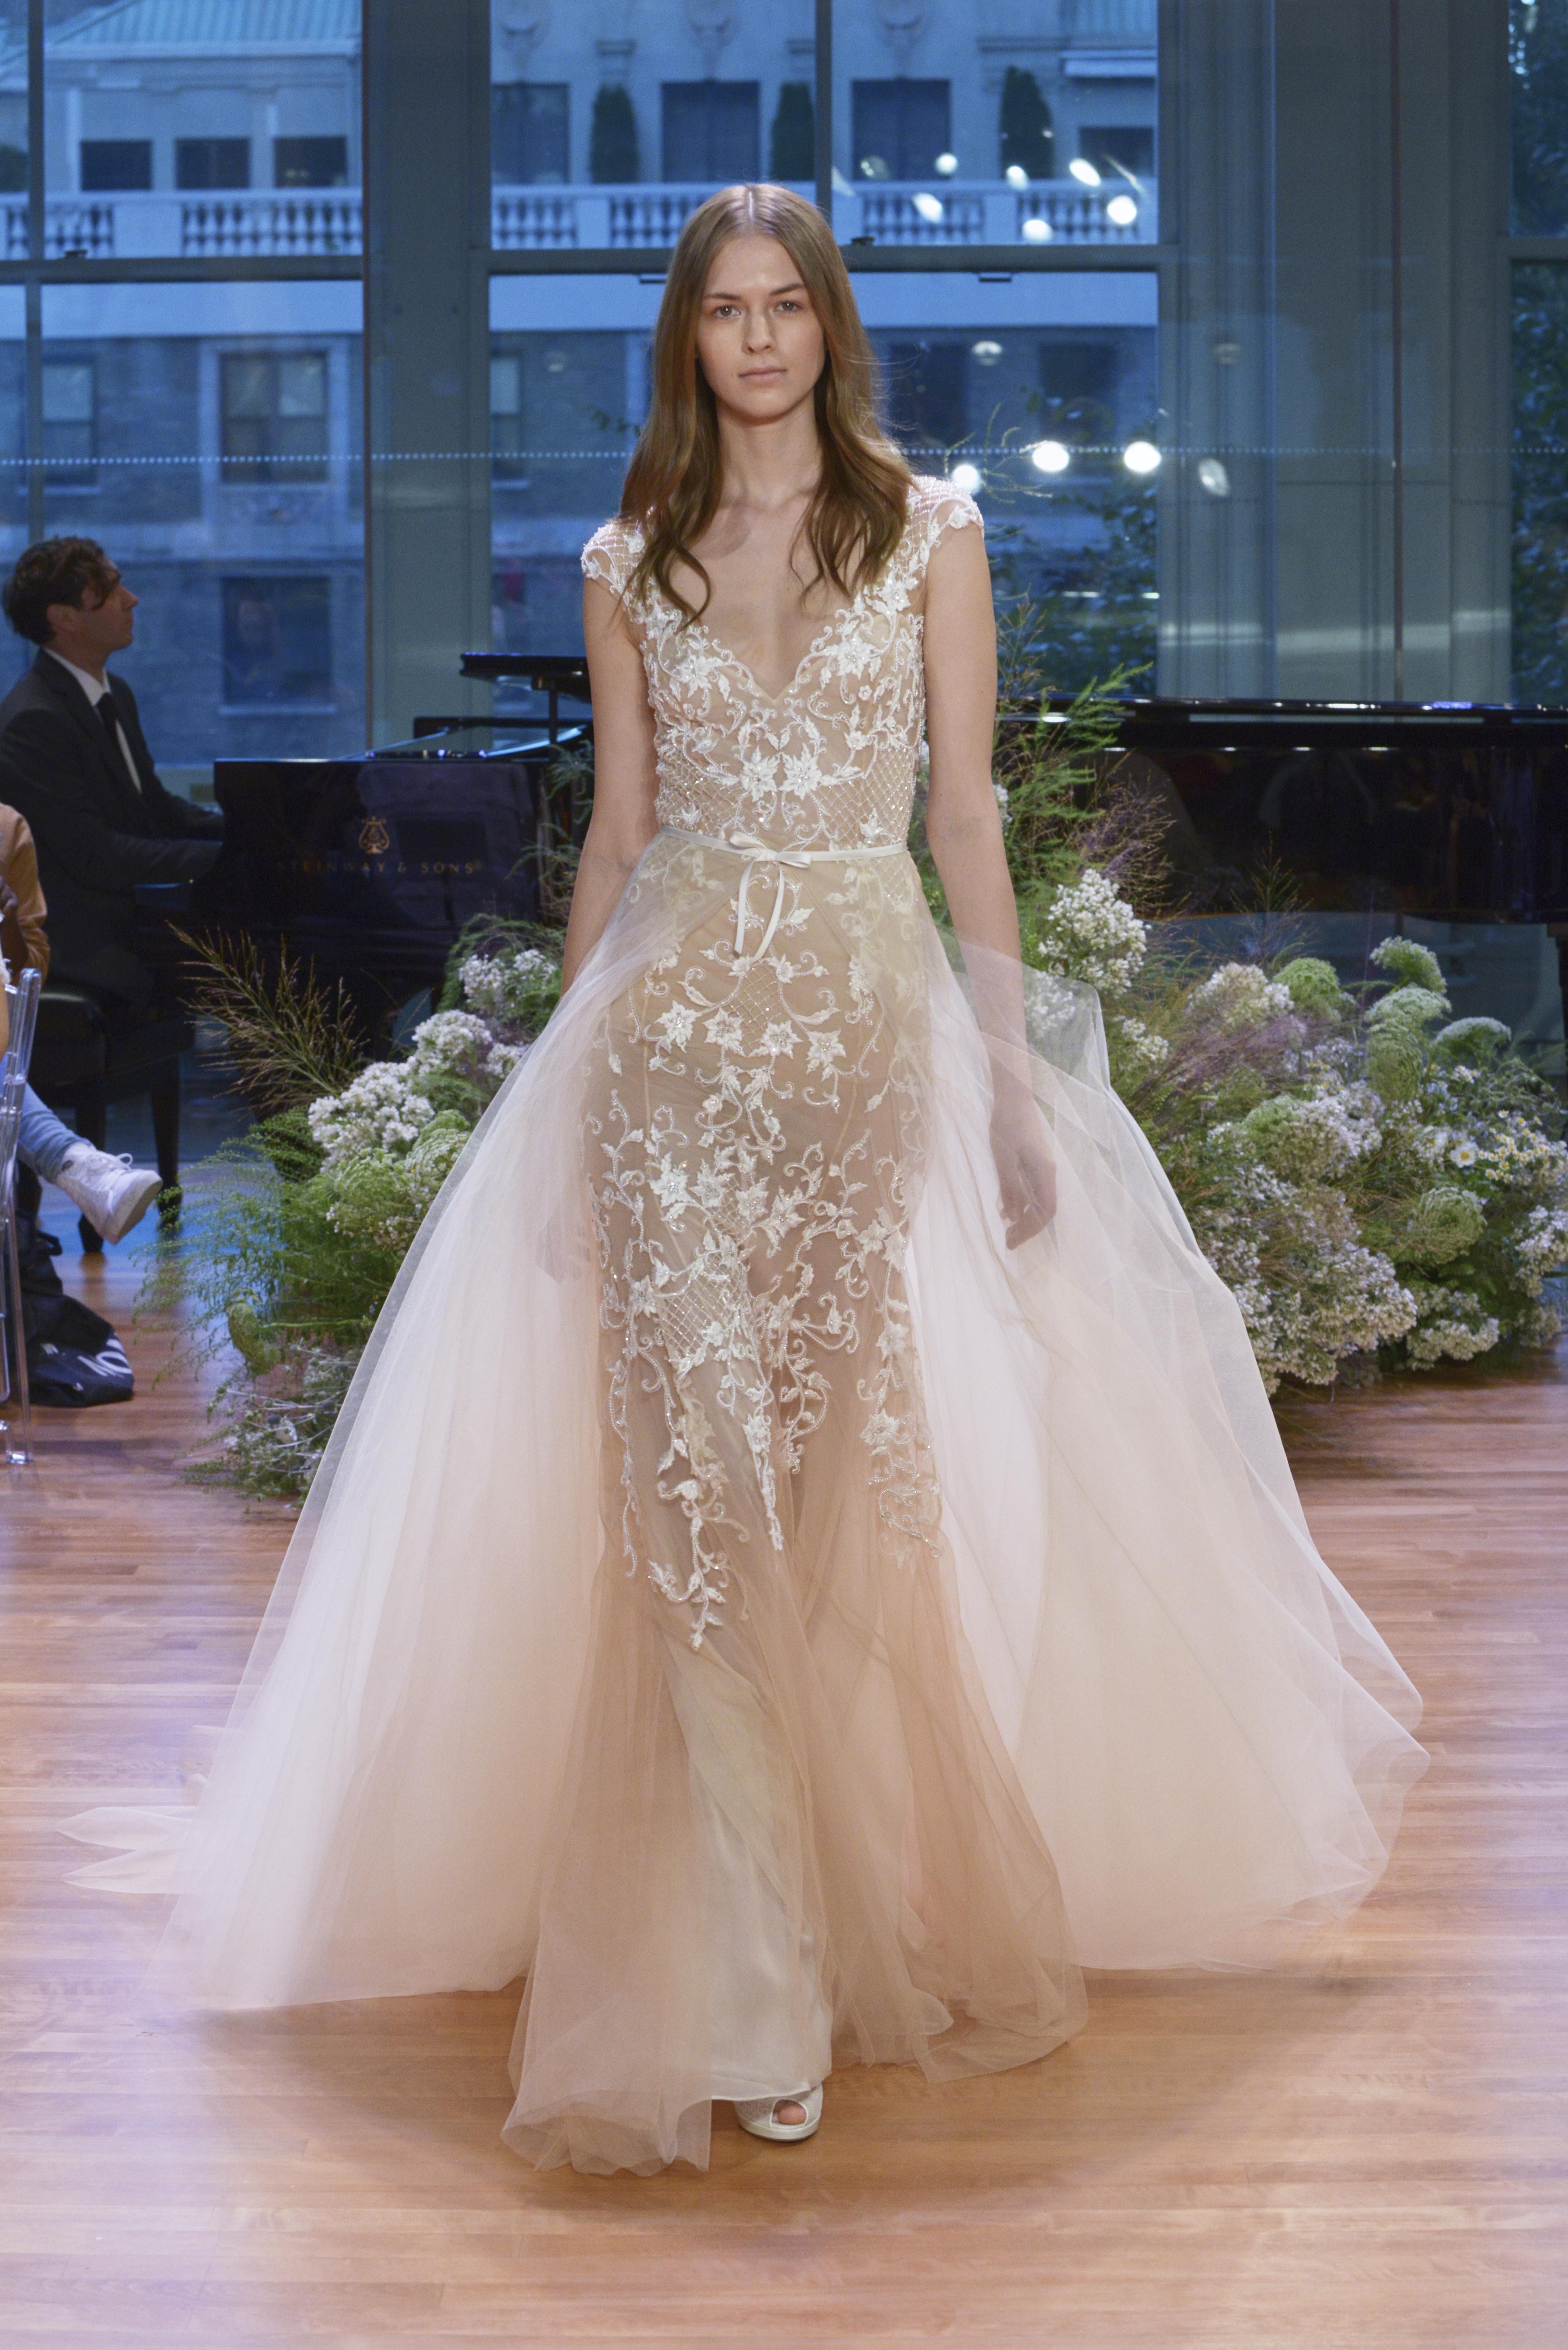 Britney spears wedding dress monique lhuillier 9317499 - cheqfm.info